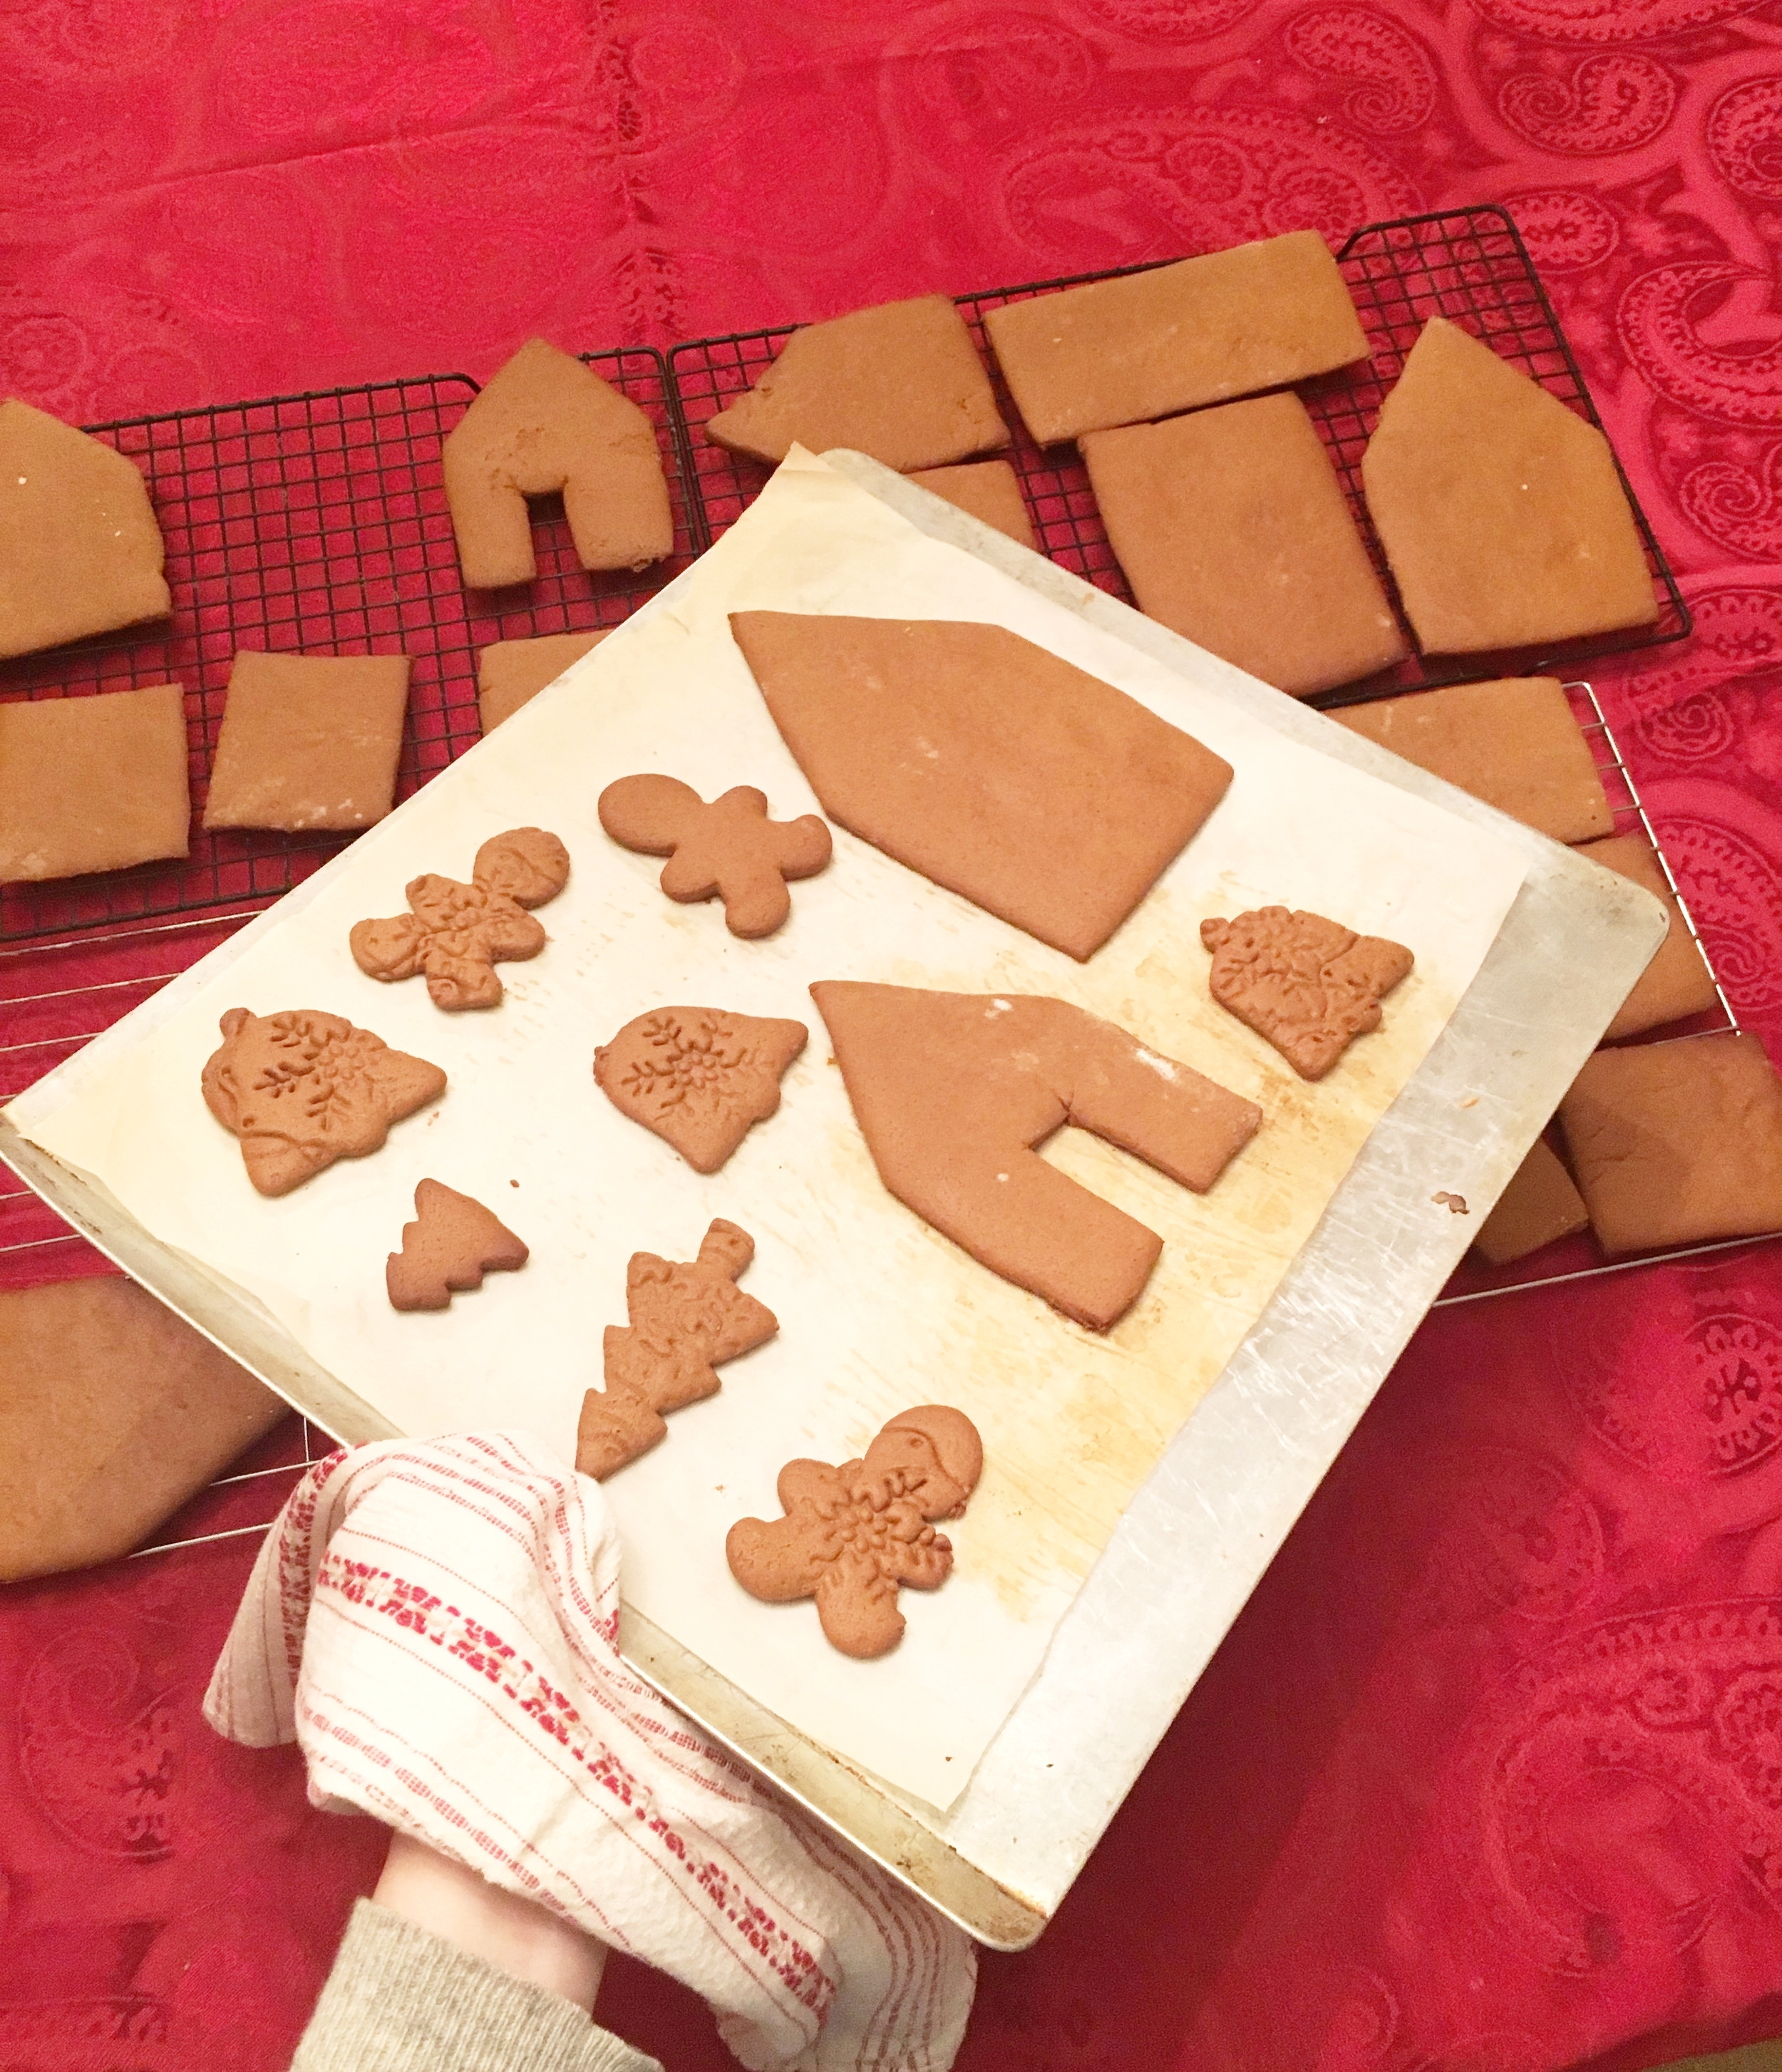 baking3.jpg